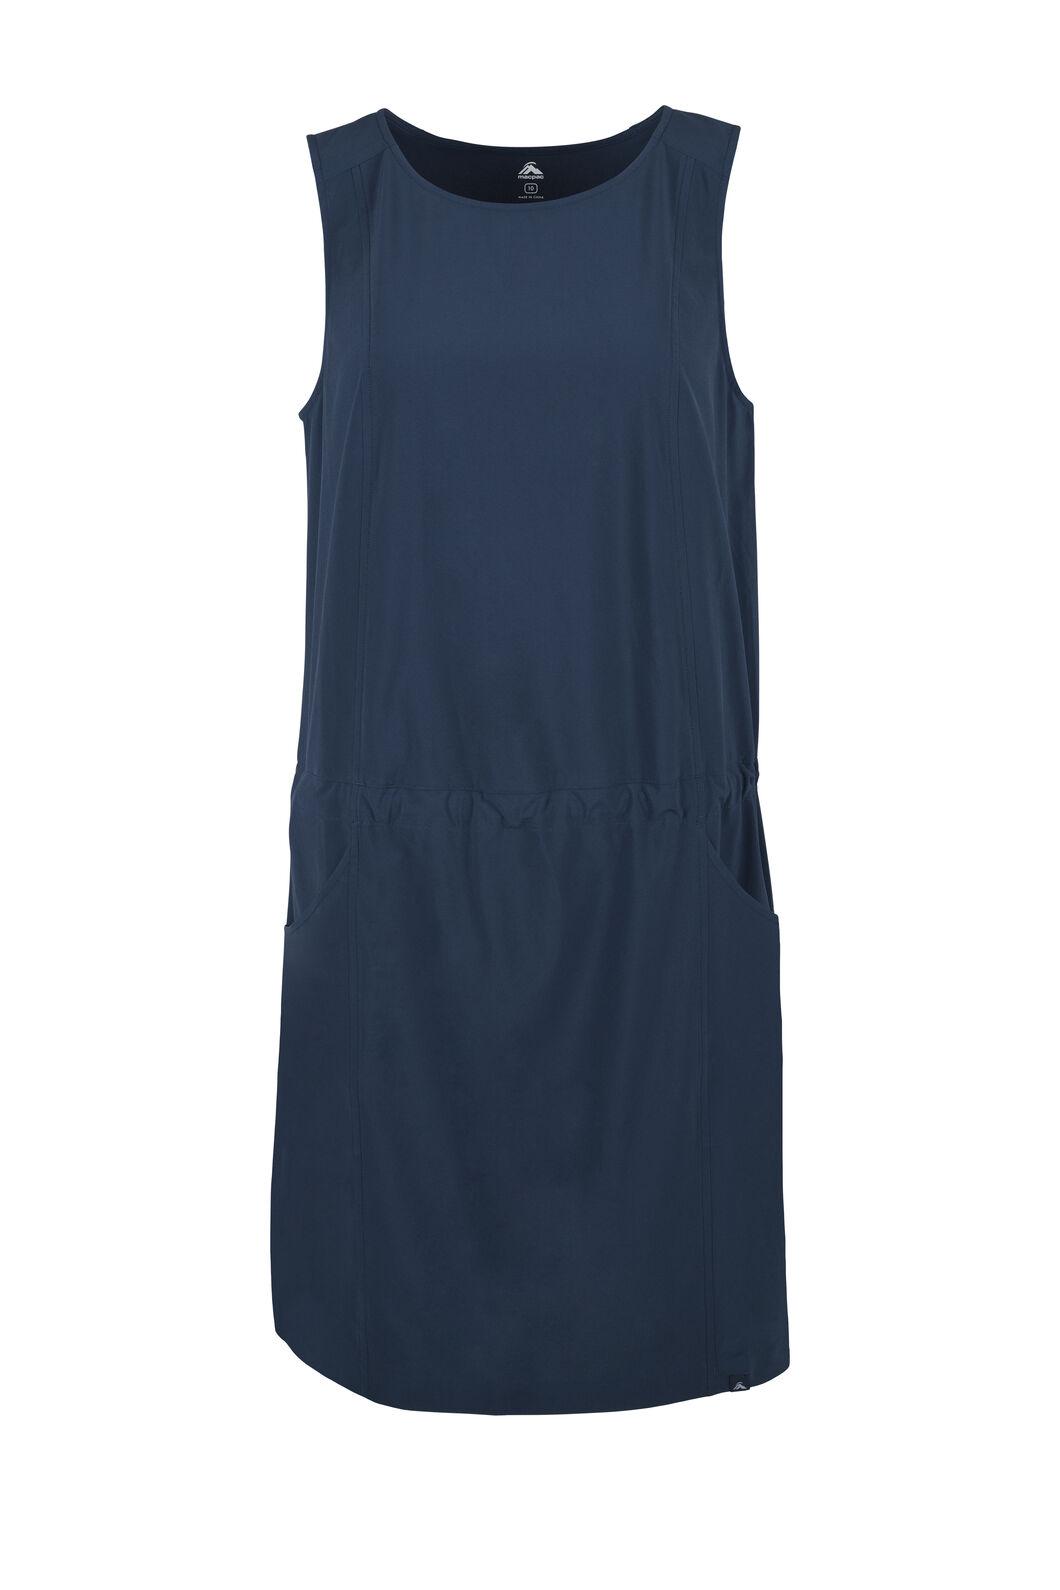 Macpac Mica Dress — Women's, Black Iris, hi-res